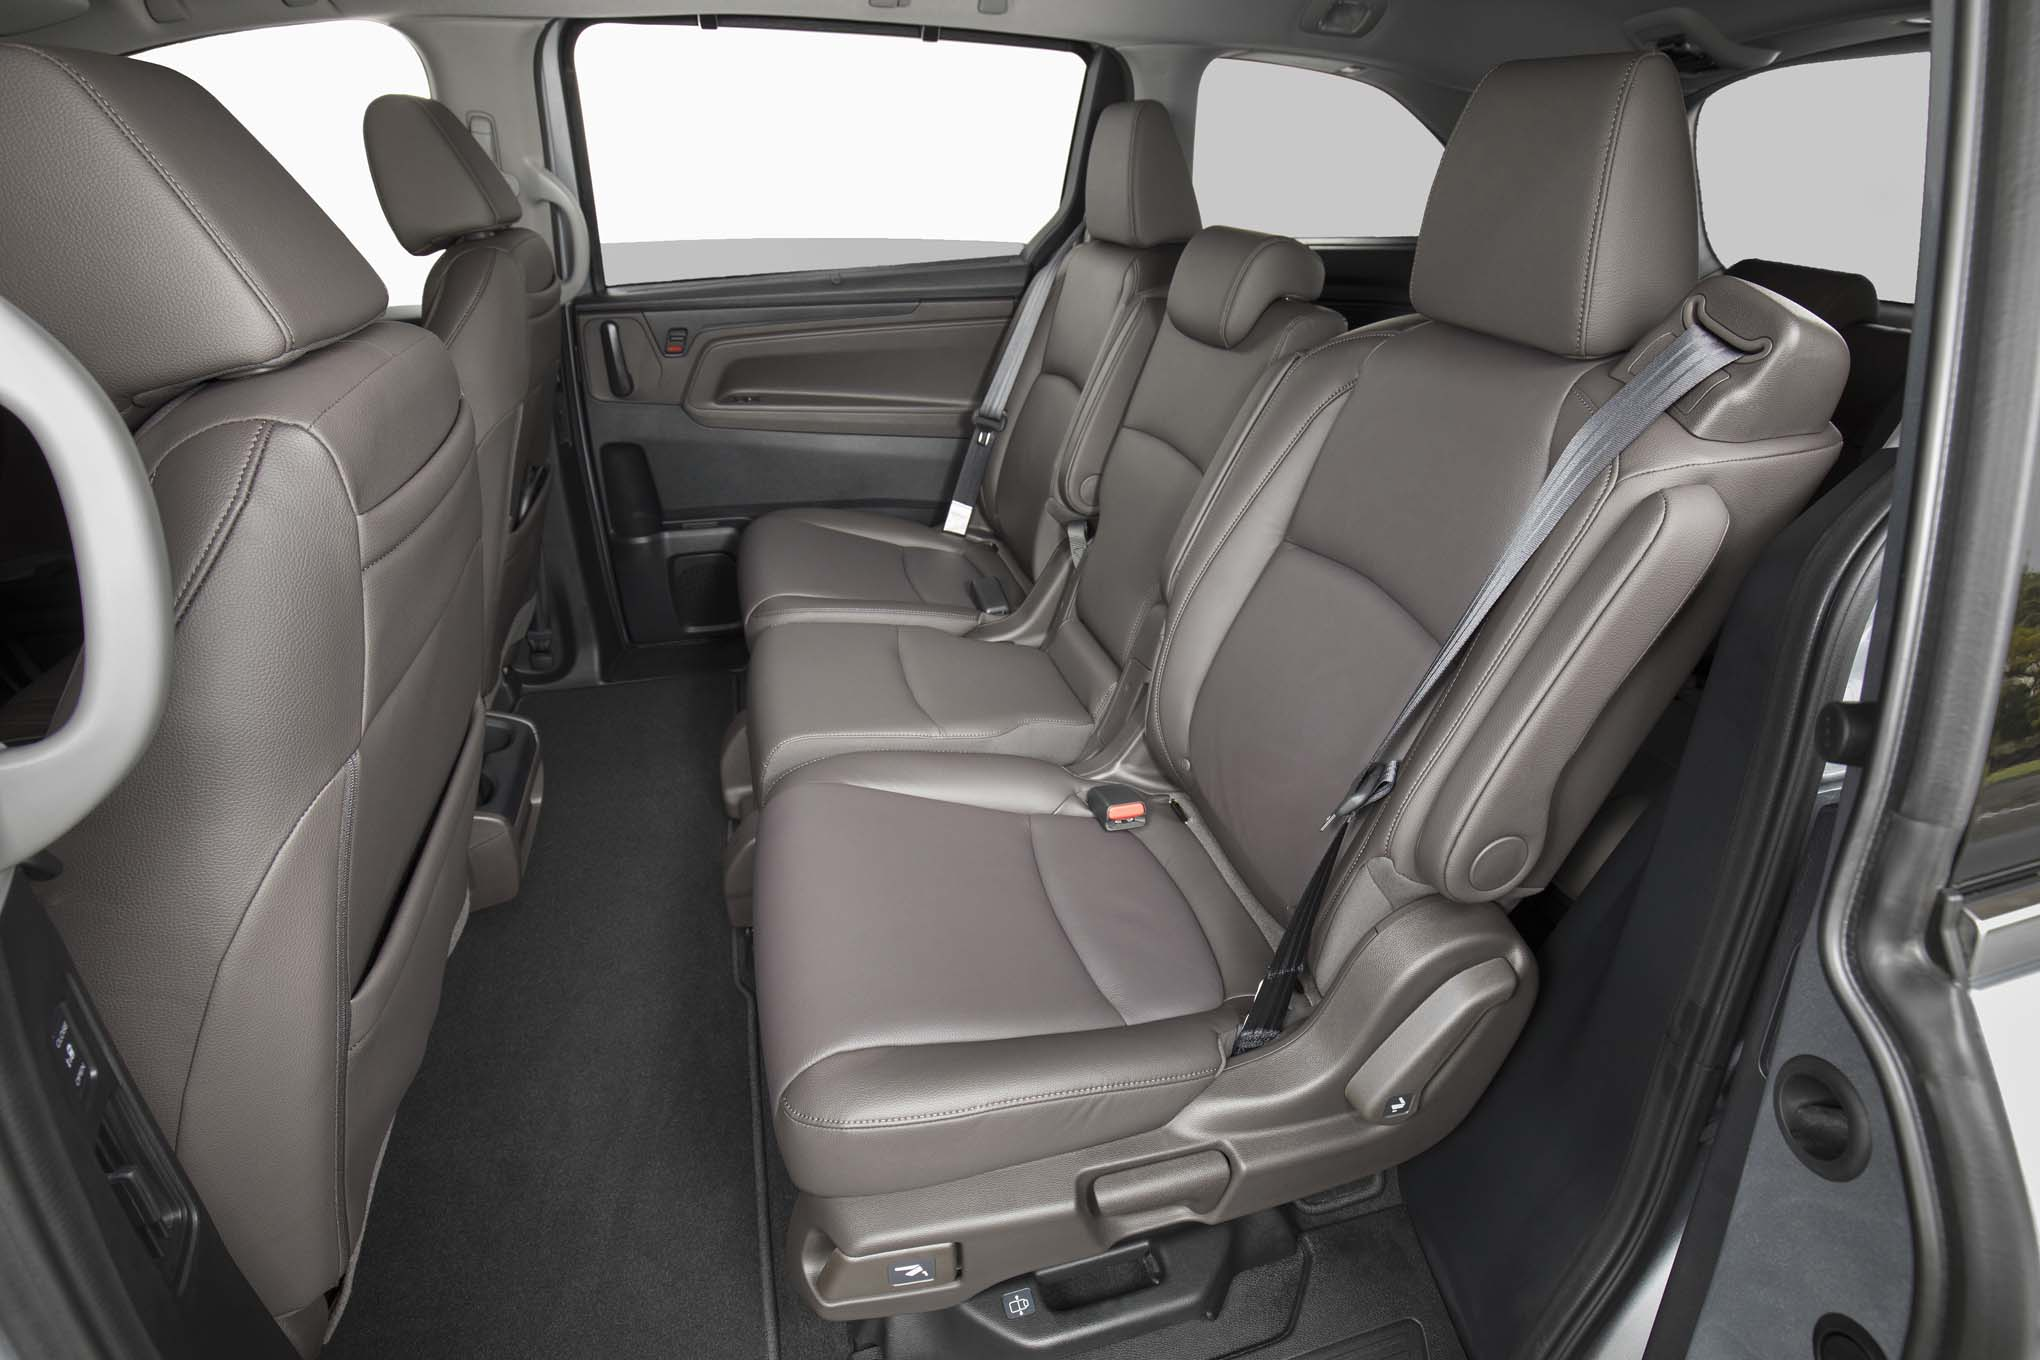 2018 Honda Odyssey Rear Interior Seats 02